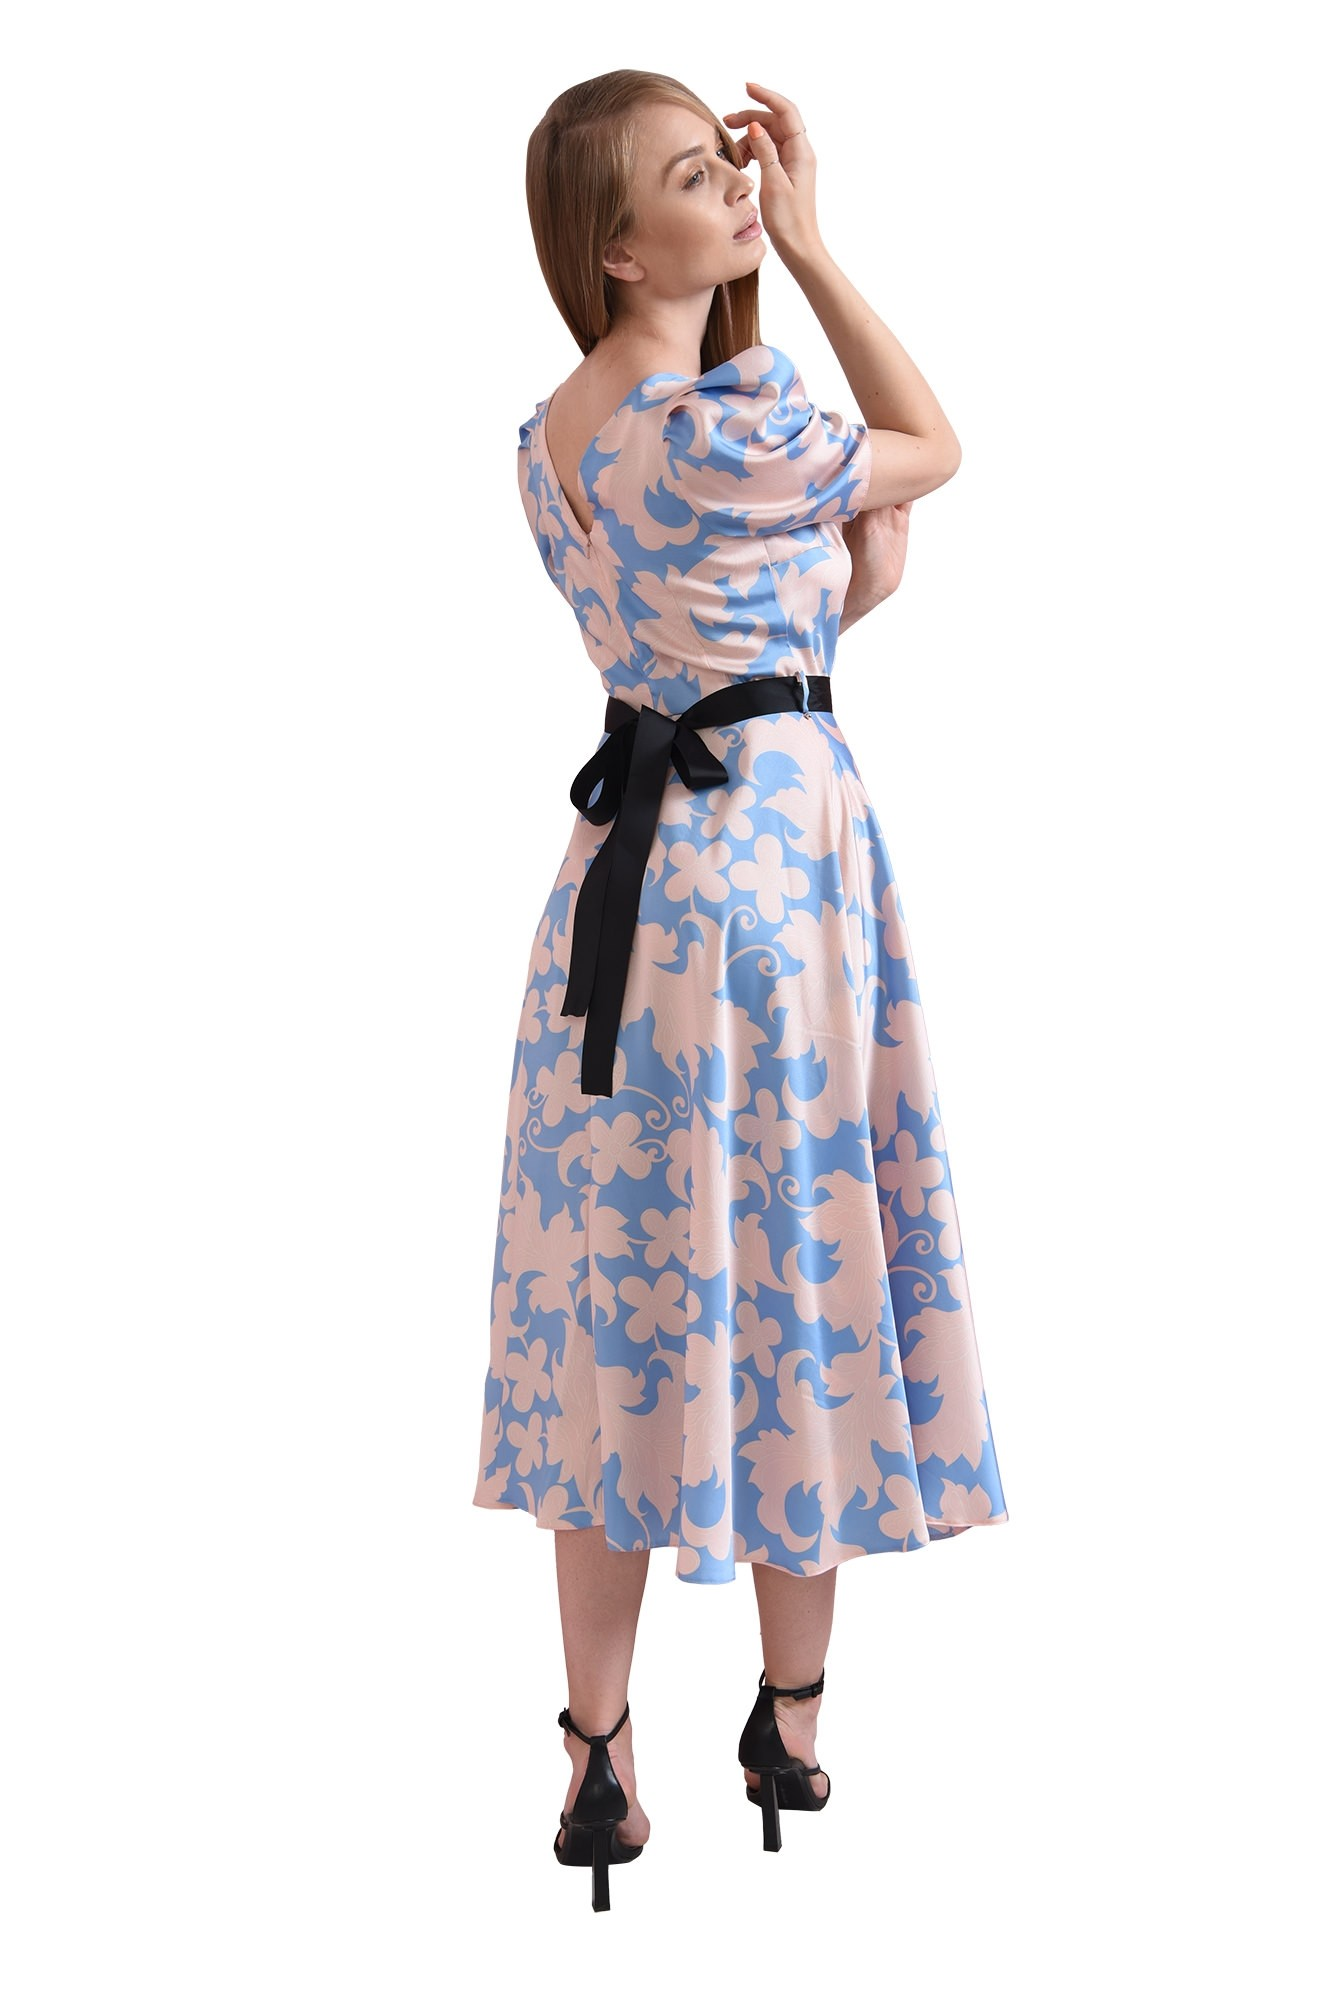 rochie evazata, bleu, cu flori